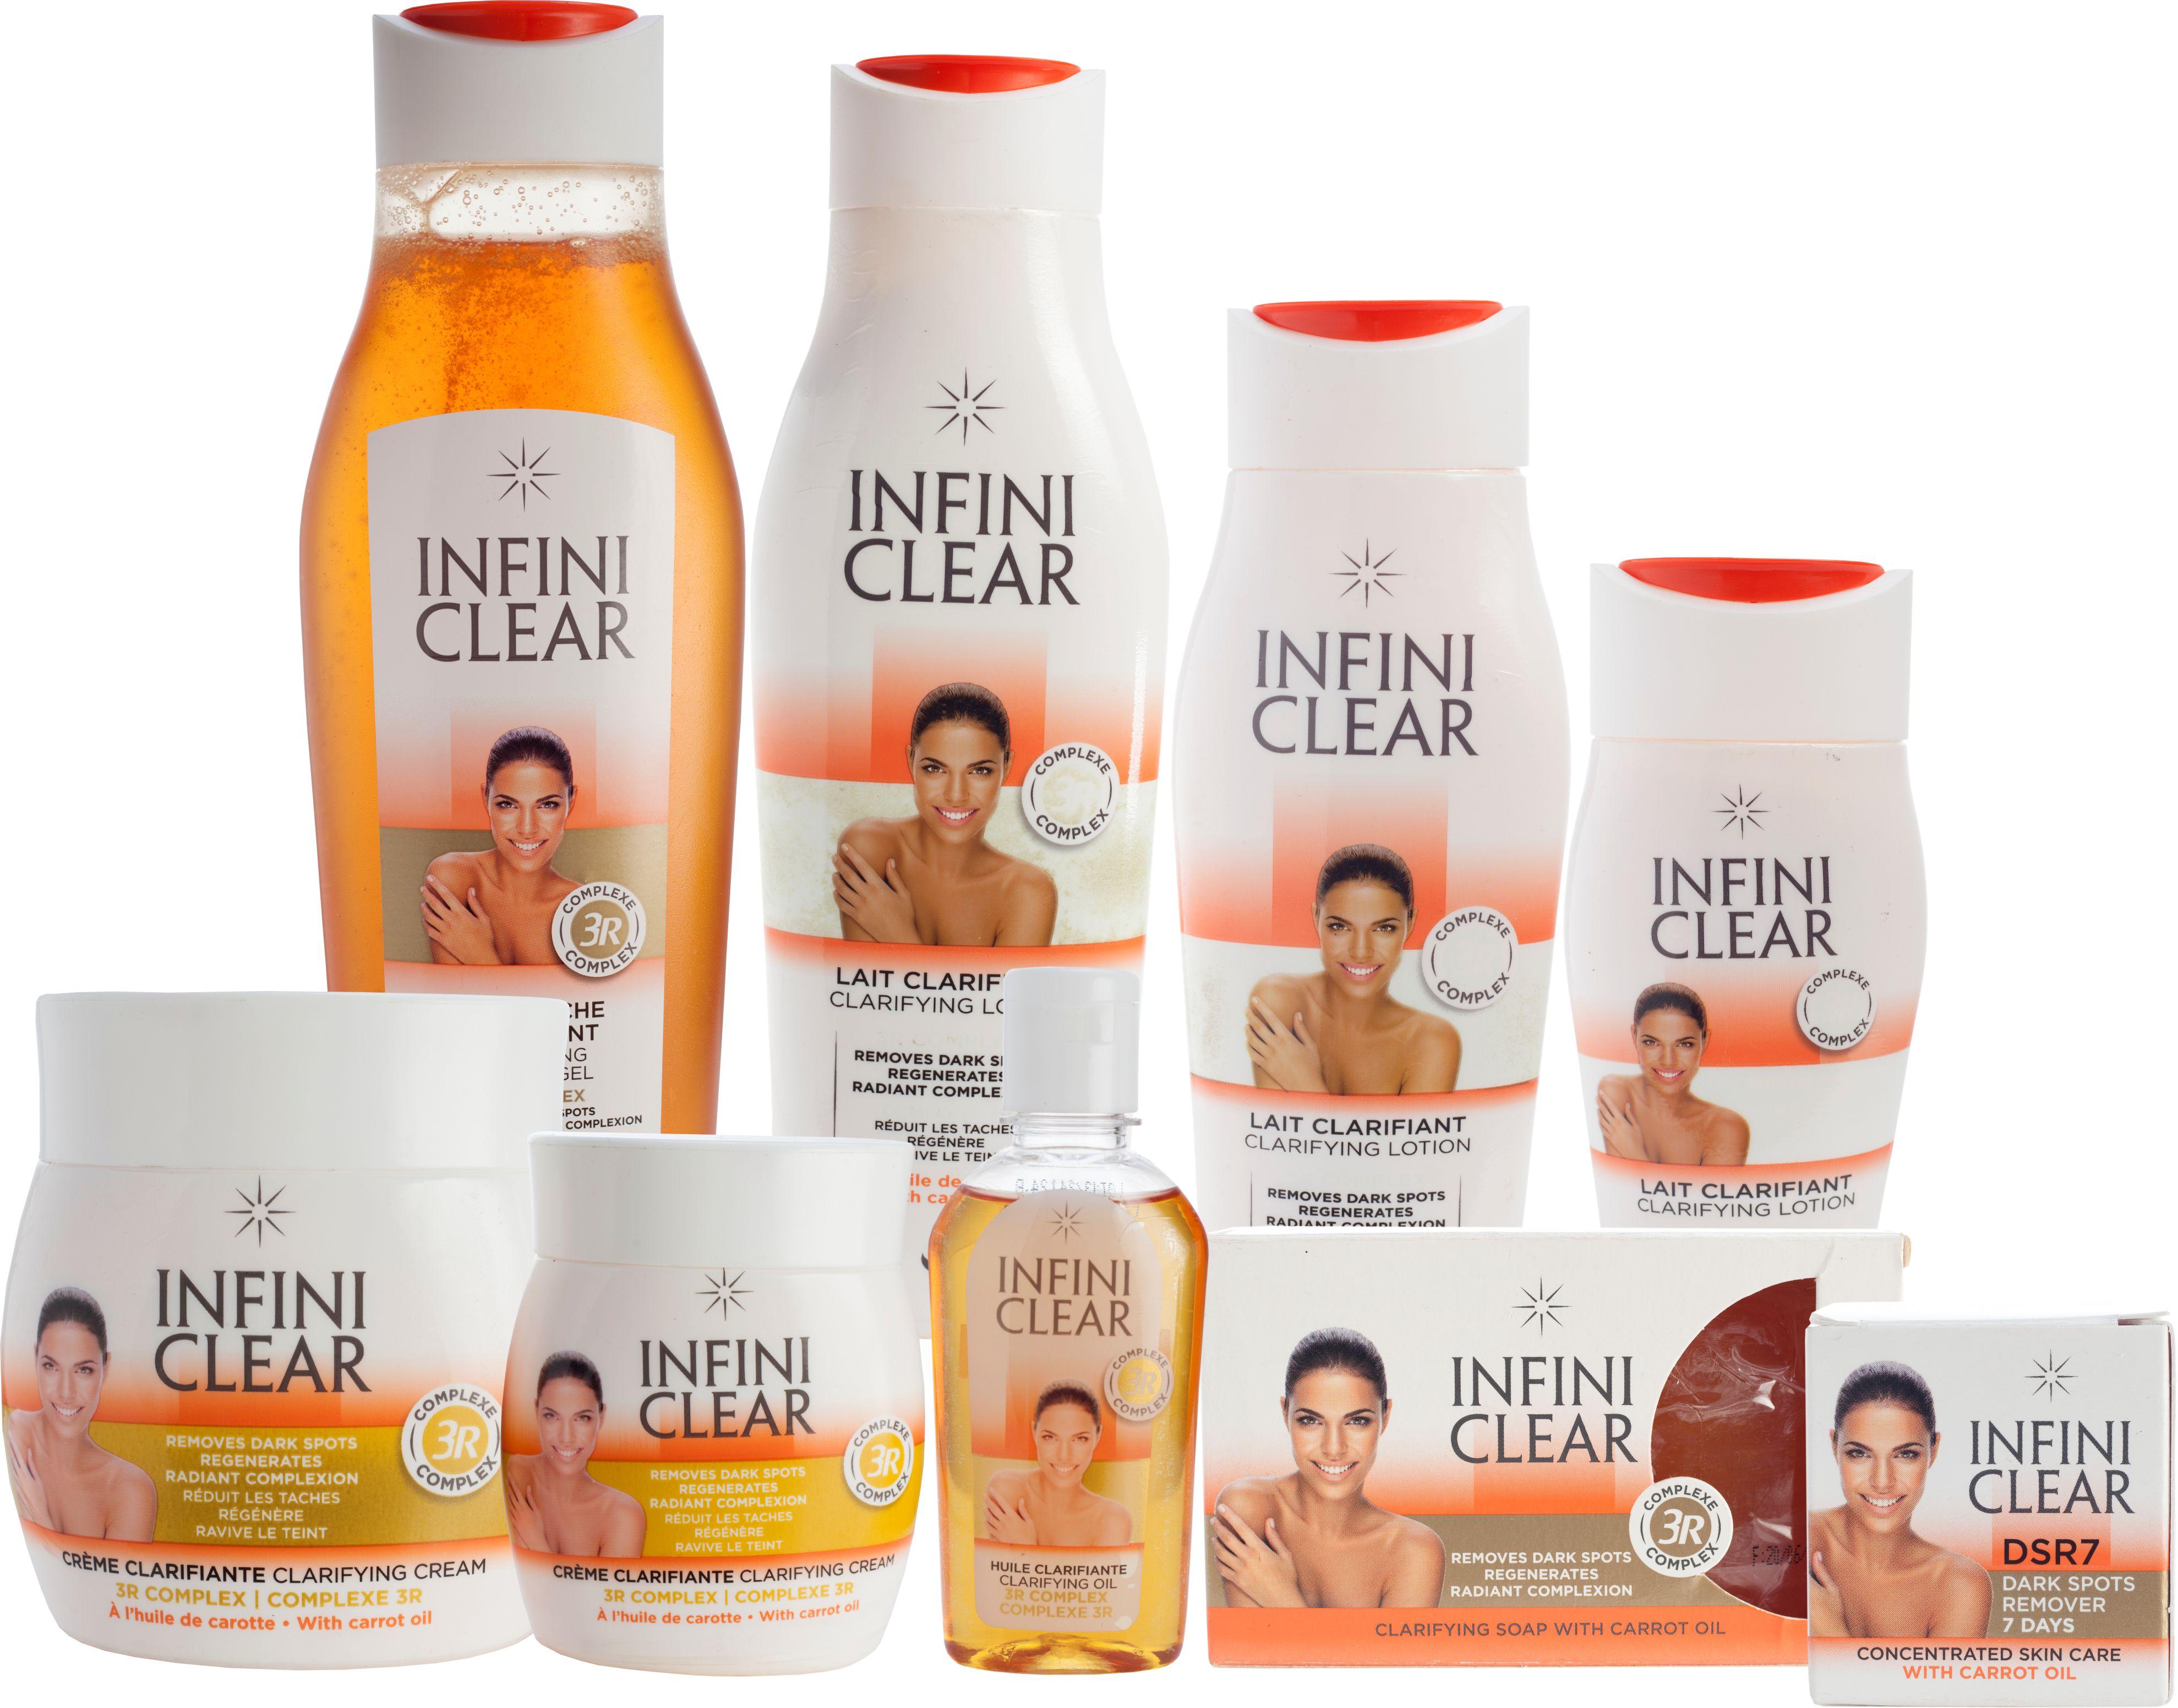 Infini Clear